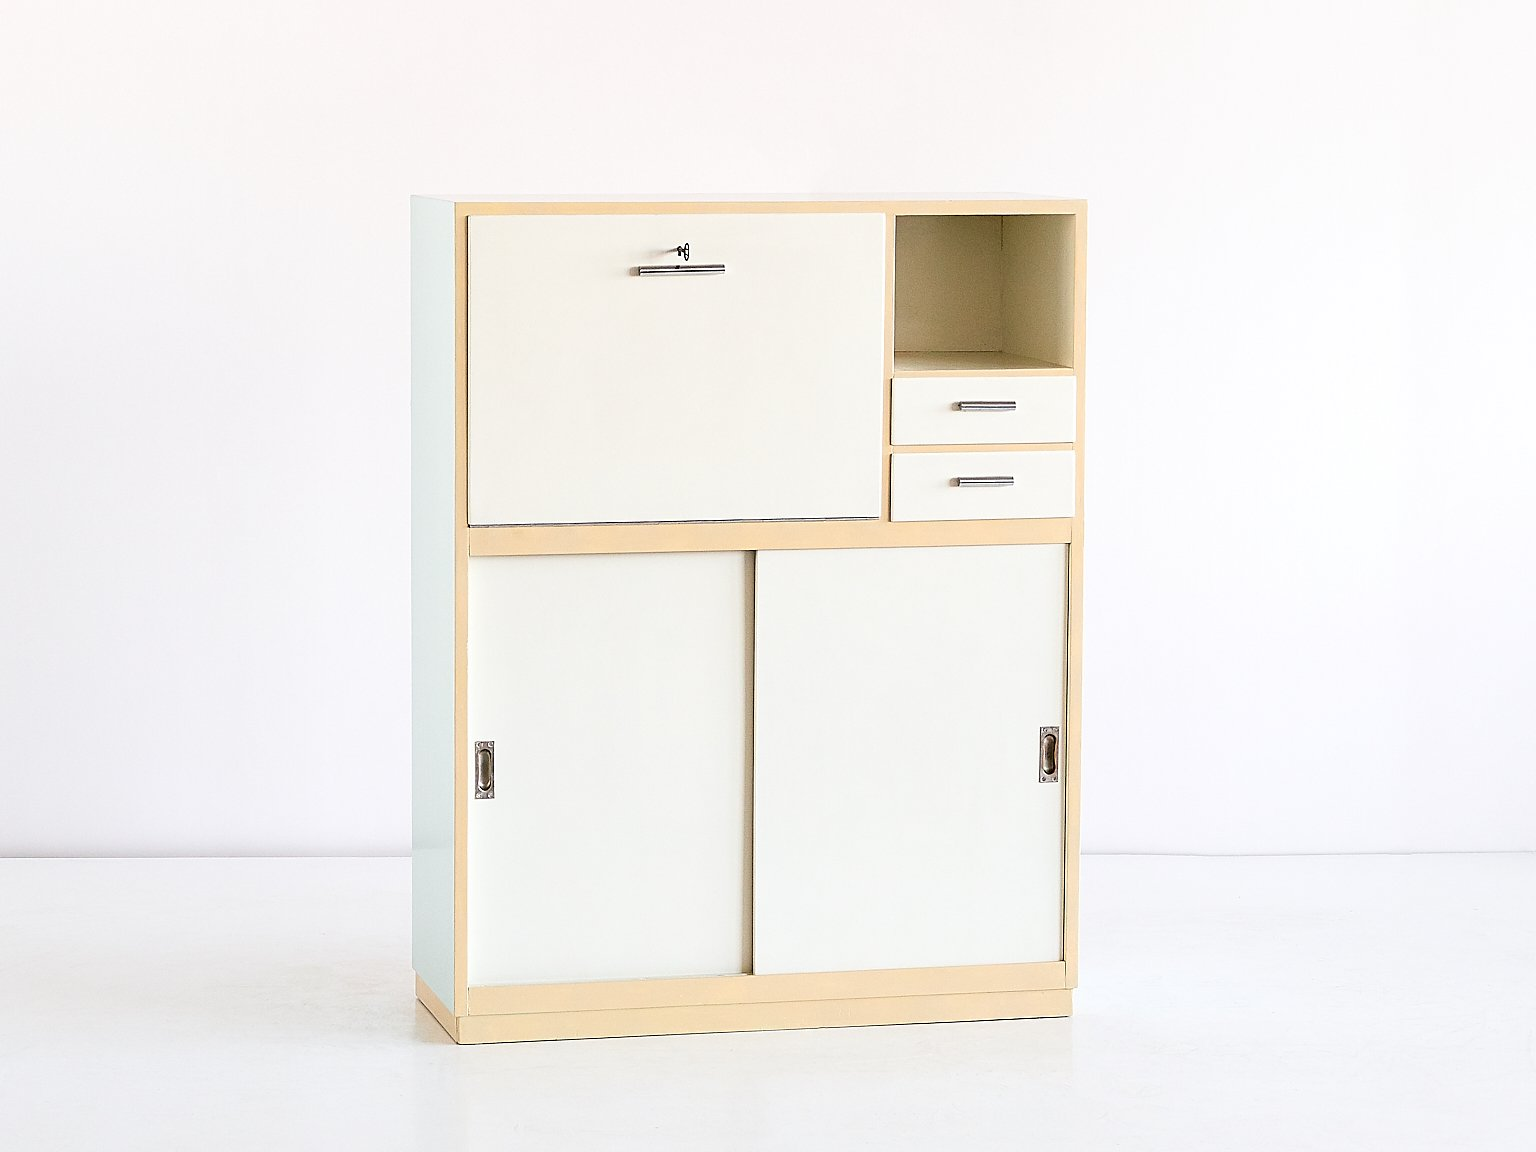 moderner sekret r schrank von willem penaat f r metz co. Black Bedroom Furniture Sets. Home Design Ideas